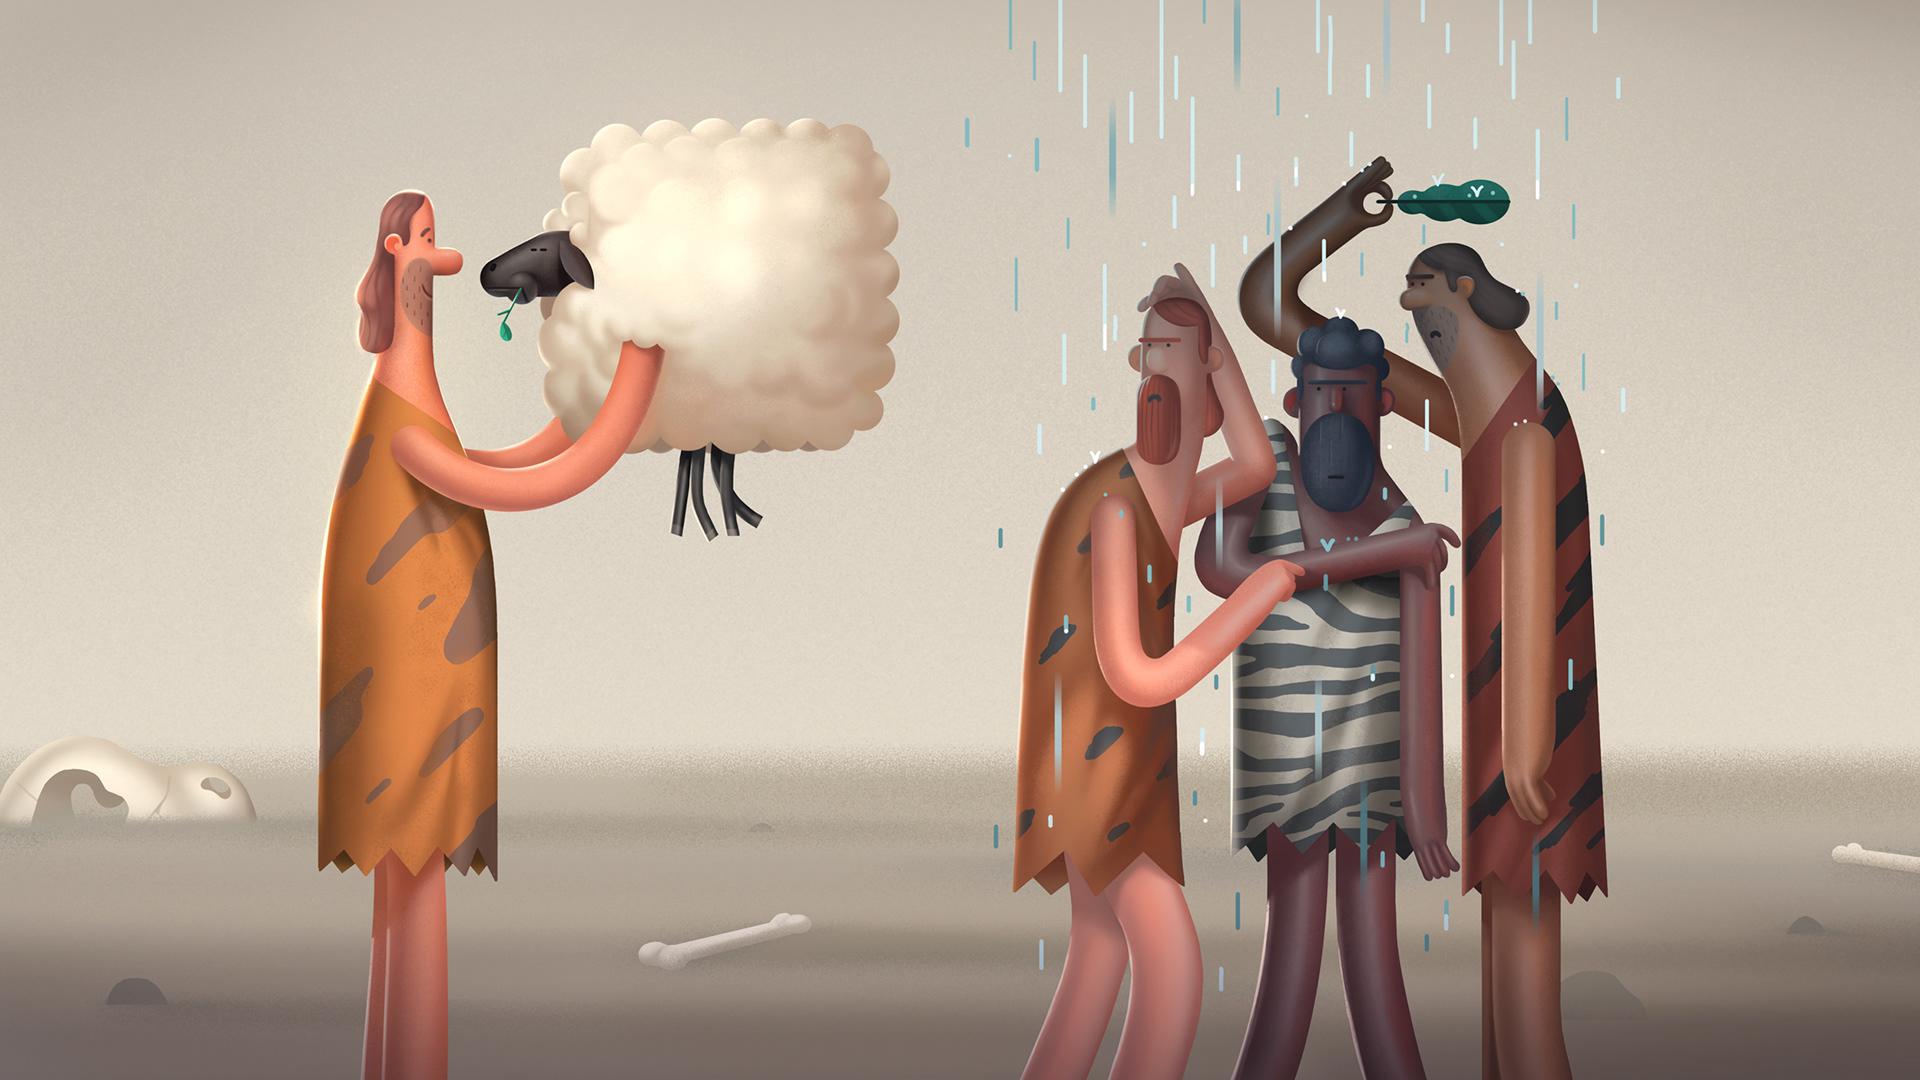 Illustration,Character Design,Digital Art